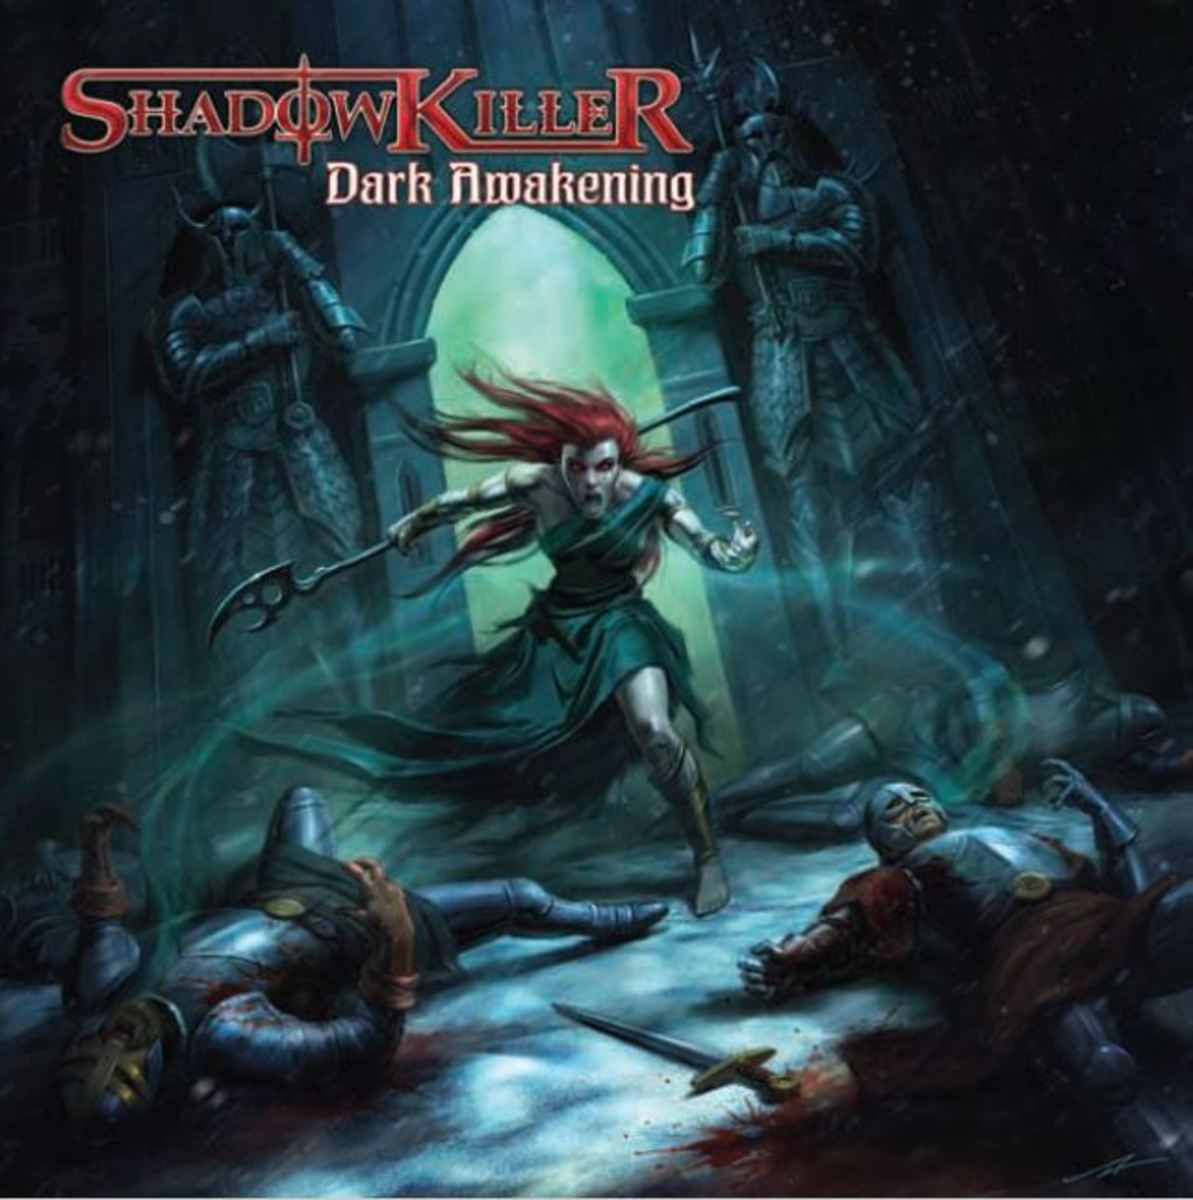 Shadowkiller,